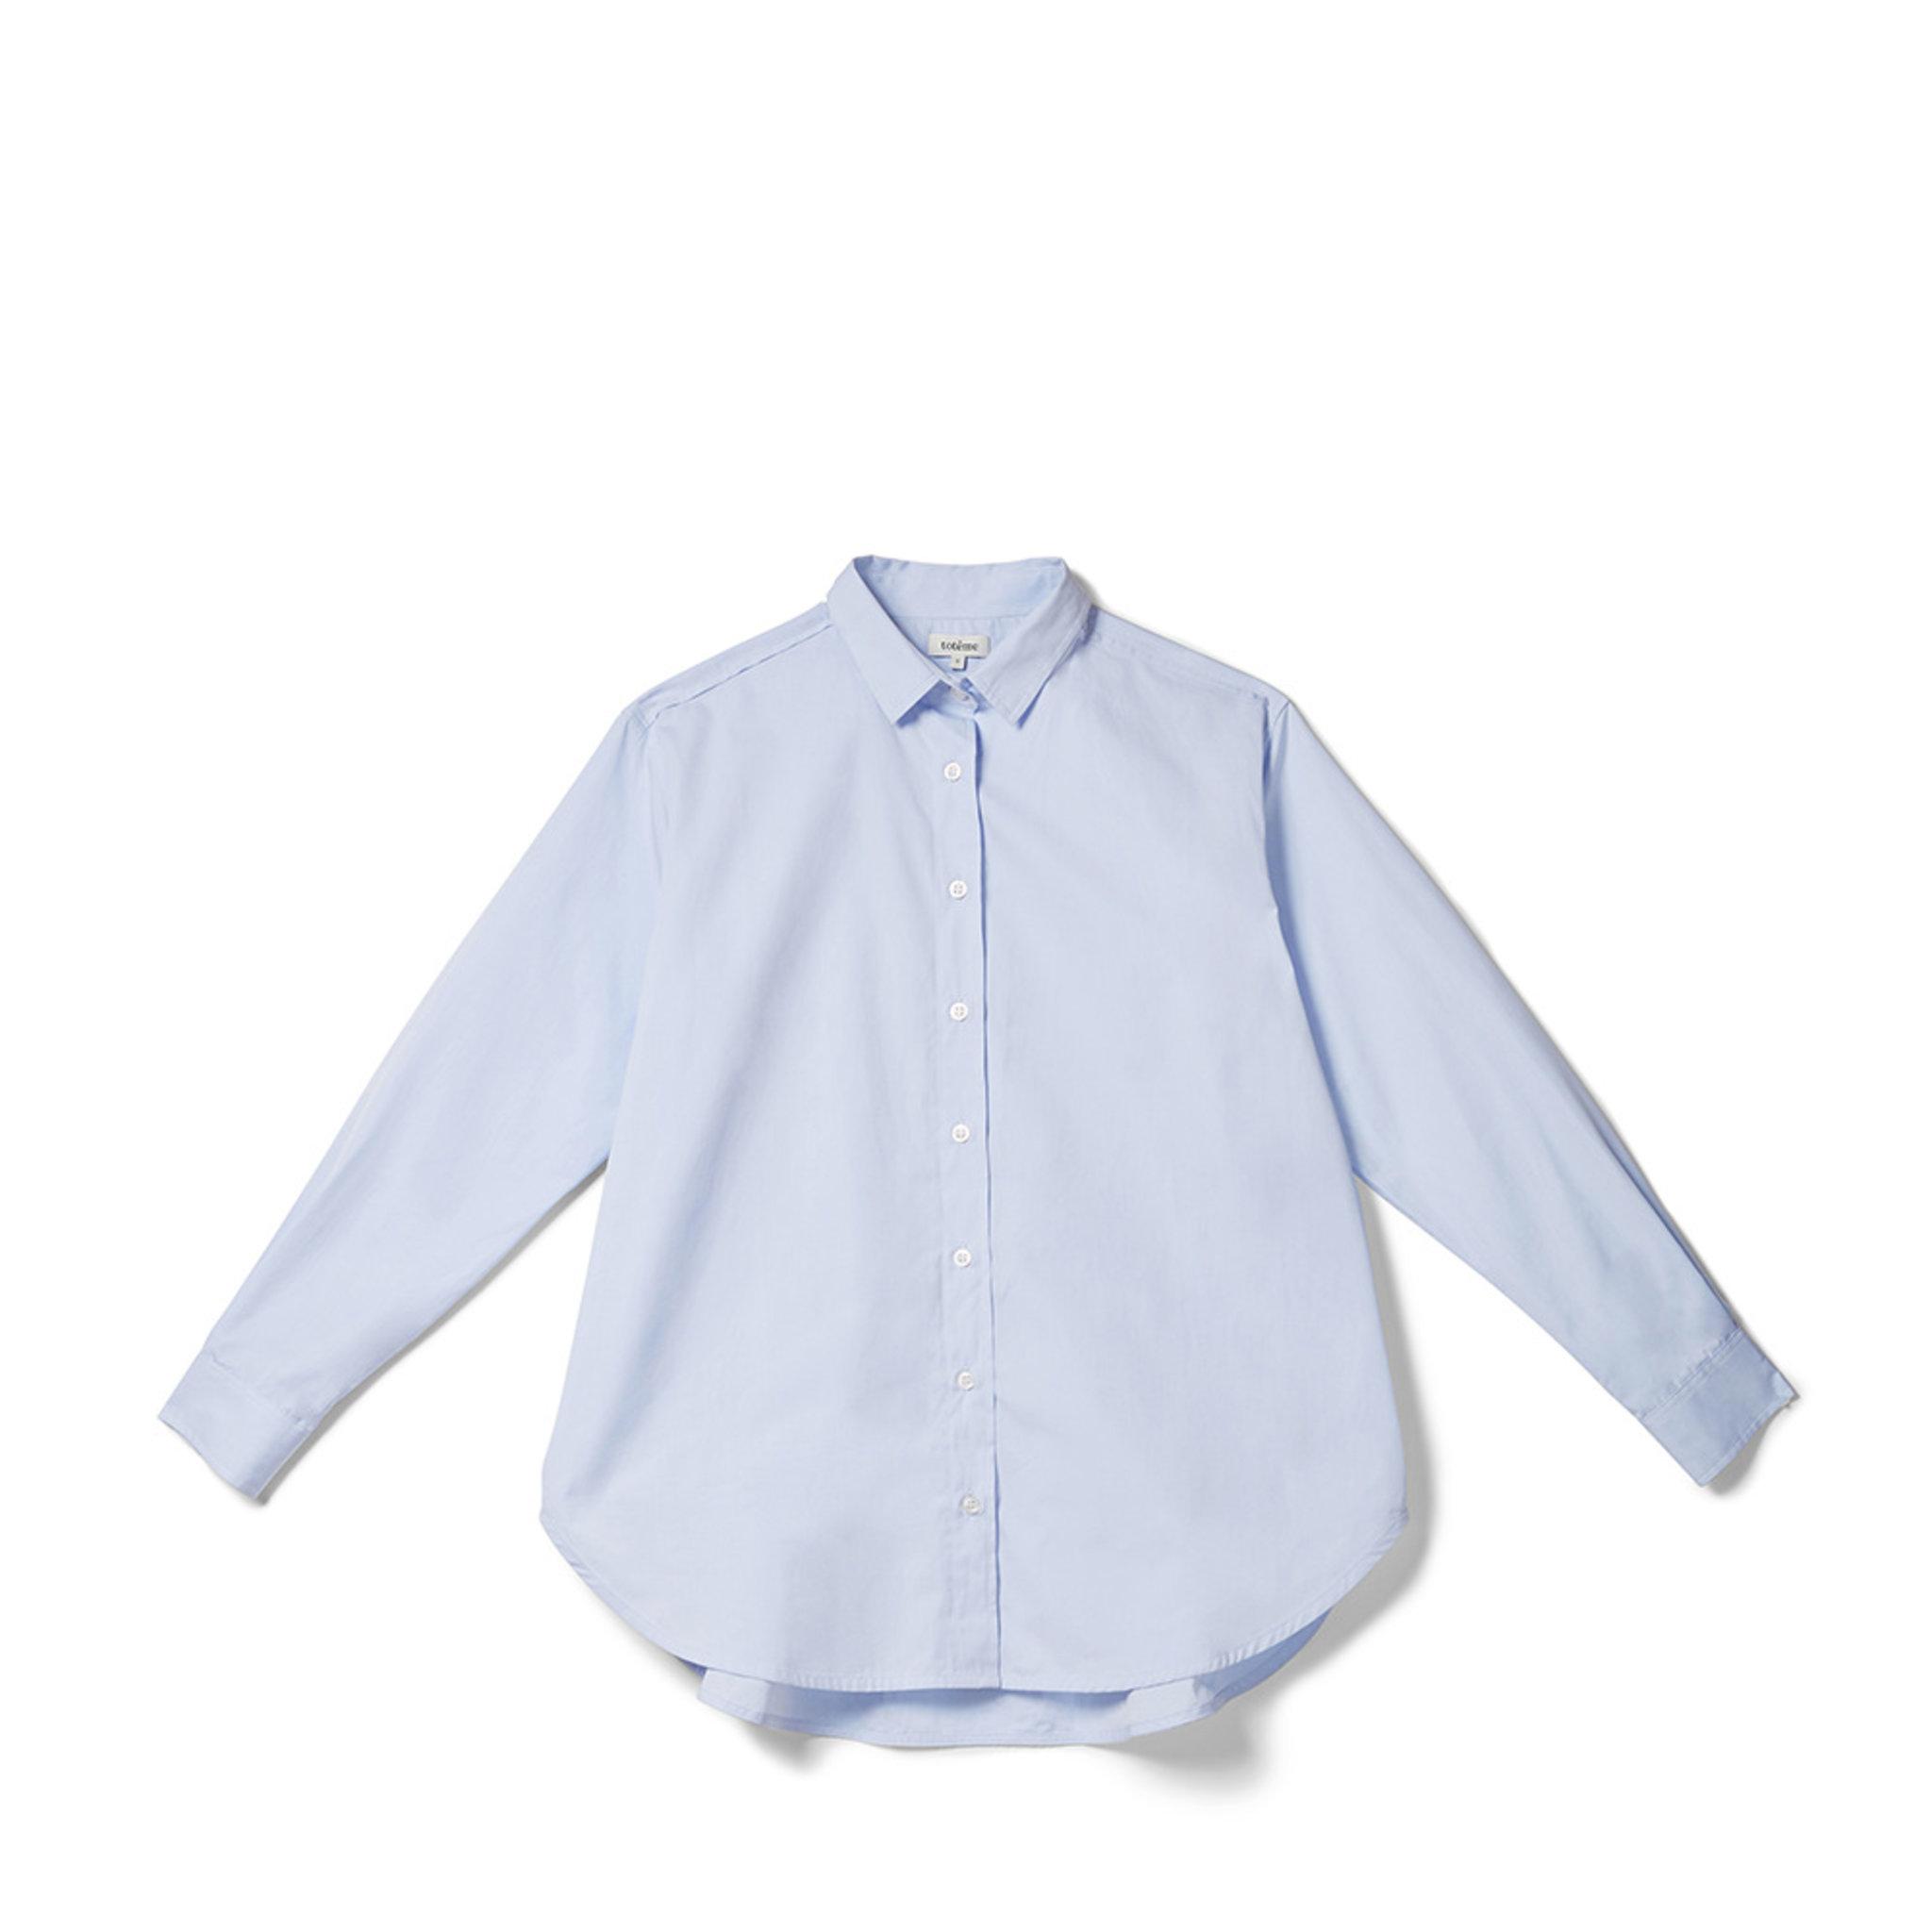 Skjorta Capri - Blusar   skjortor - Köp online på åhlens.se! 34ec7a0346373